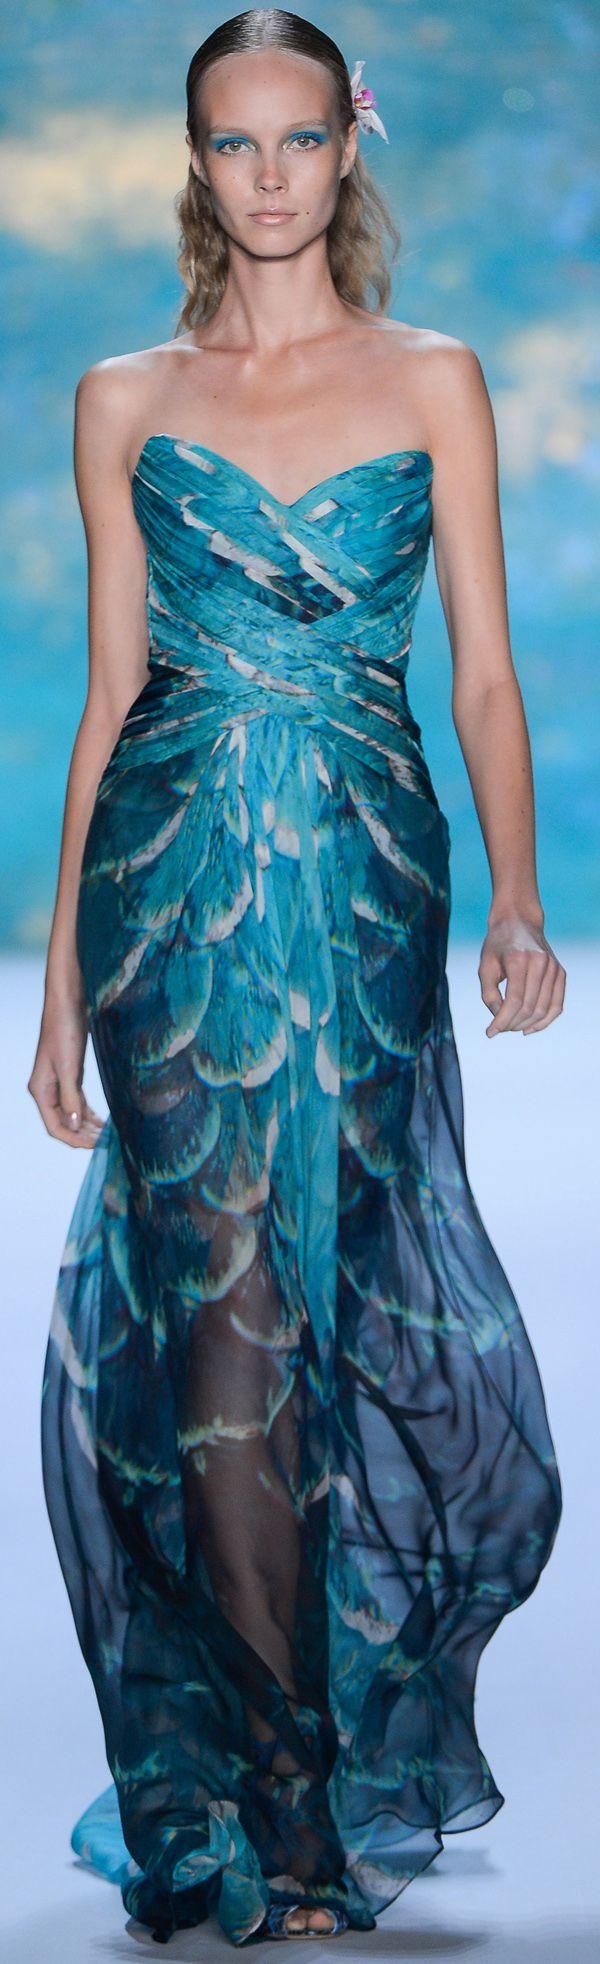 795 best favourites images on Pinterest | Feminine fashion, Formal ...